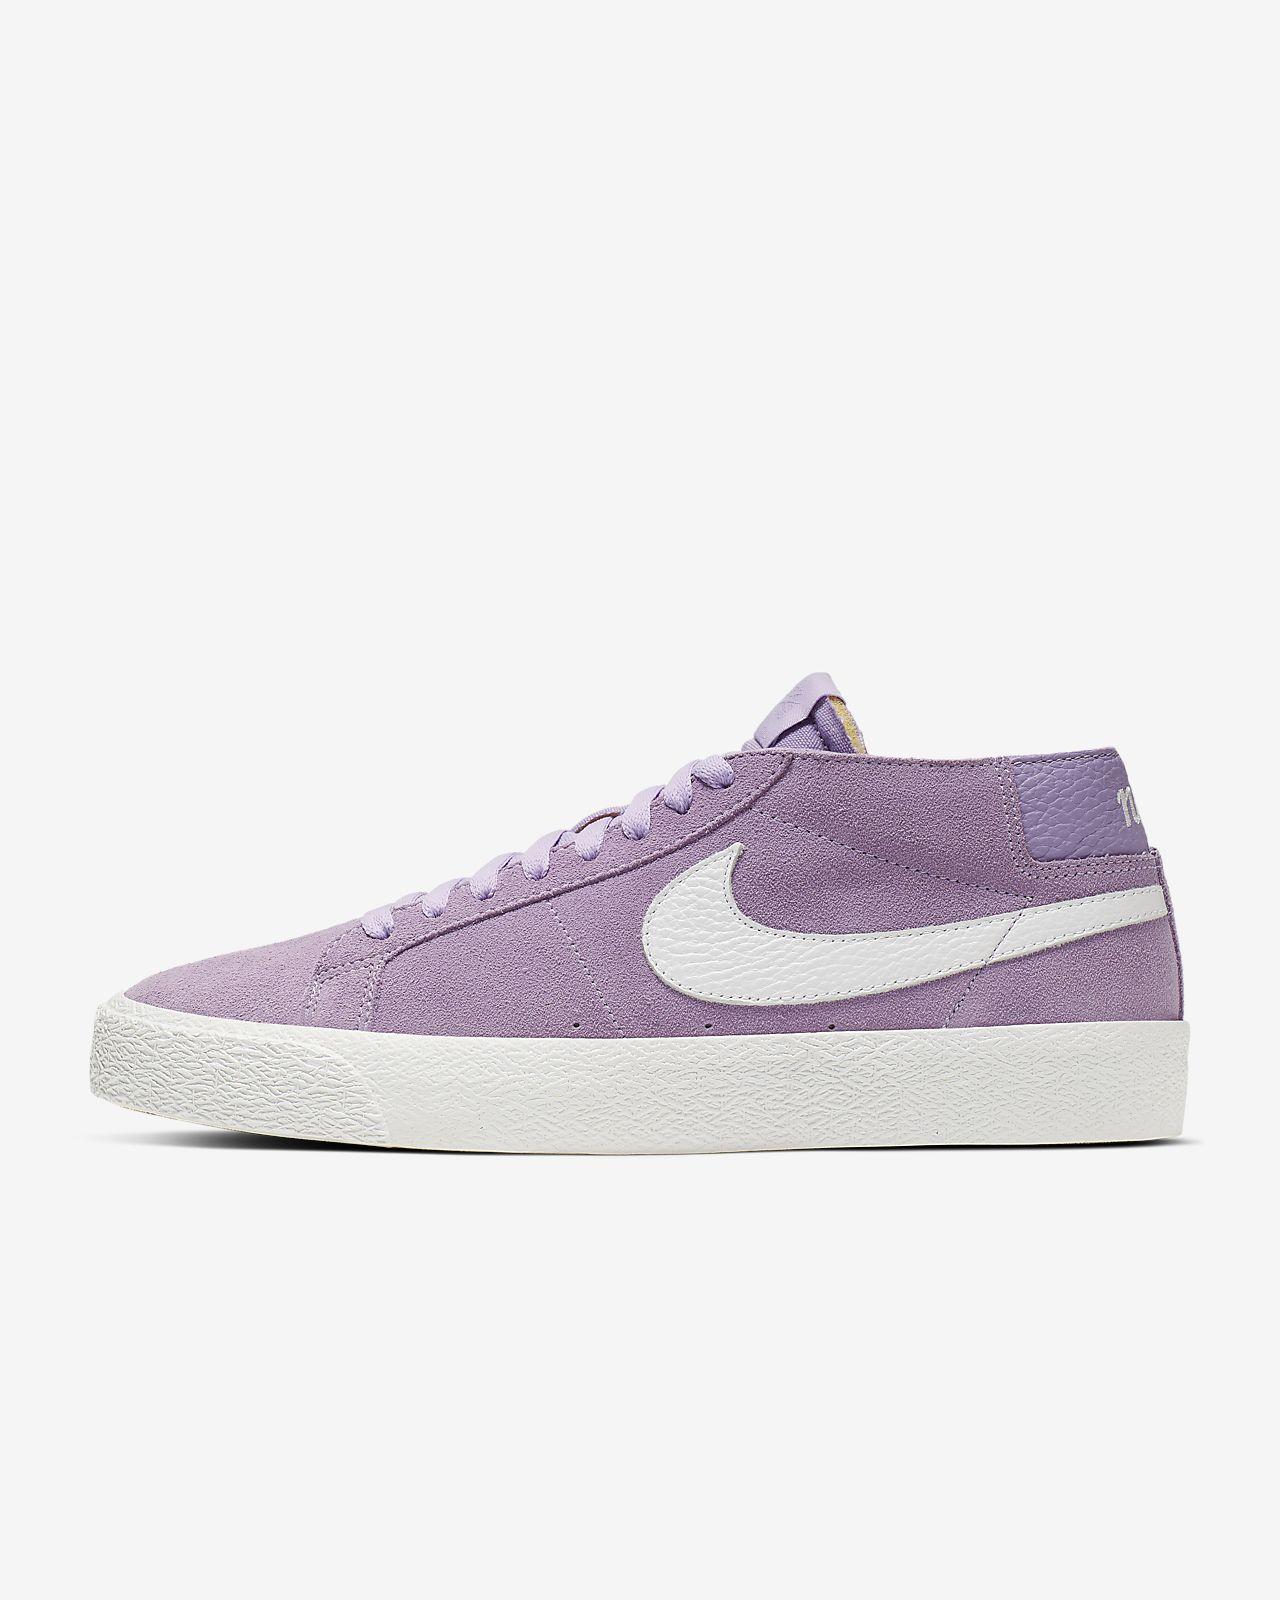 separation shoes differently where to buy Nike SB Zoom Blazer Chukka Herren-Skateboardschuh